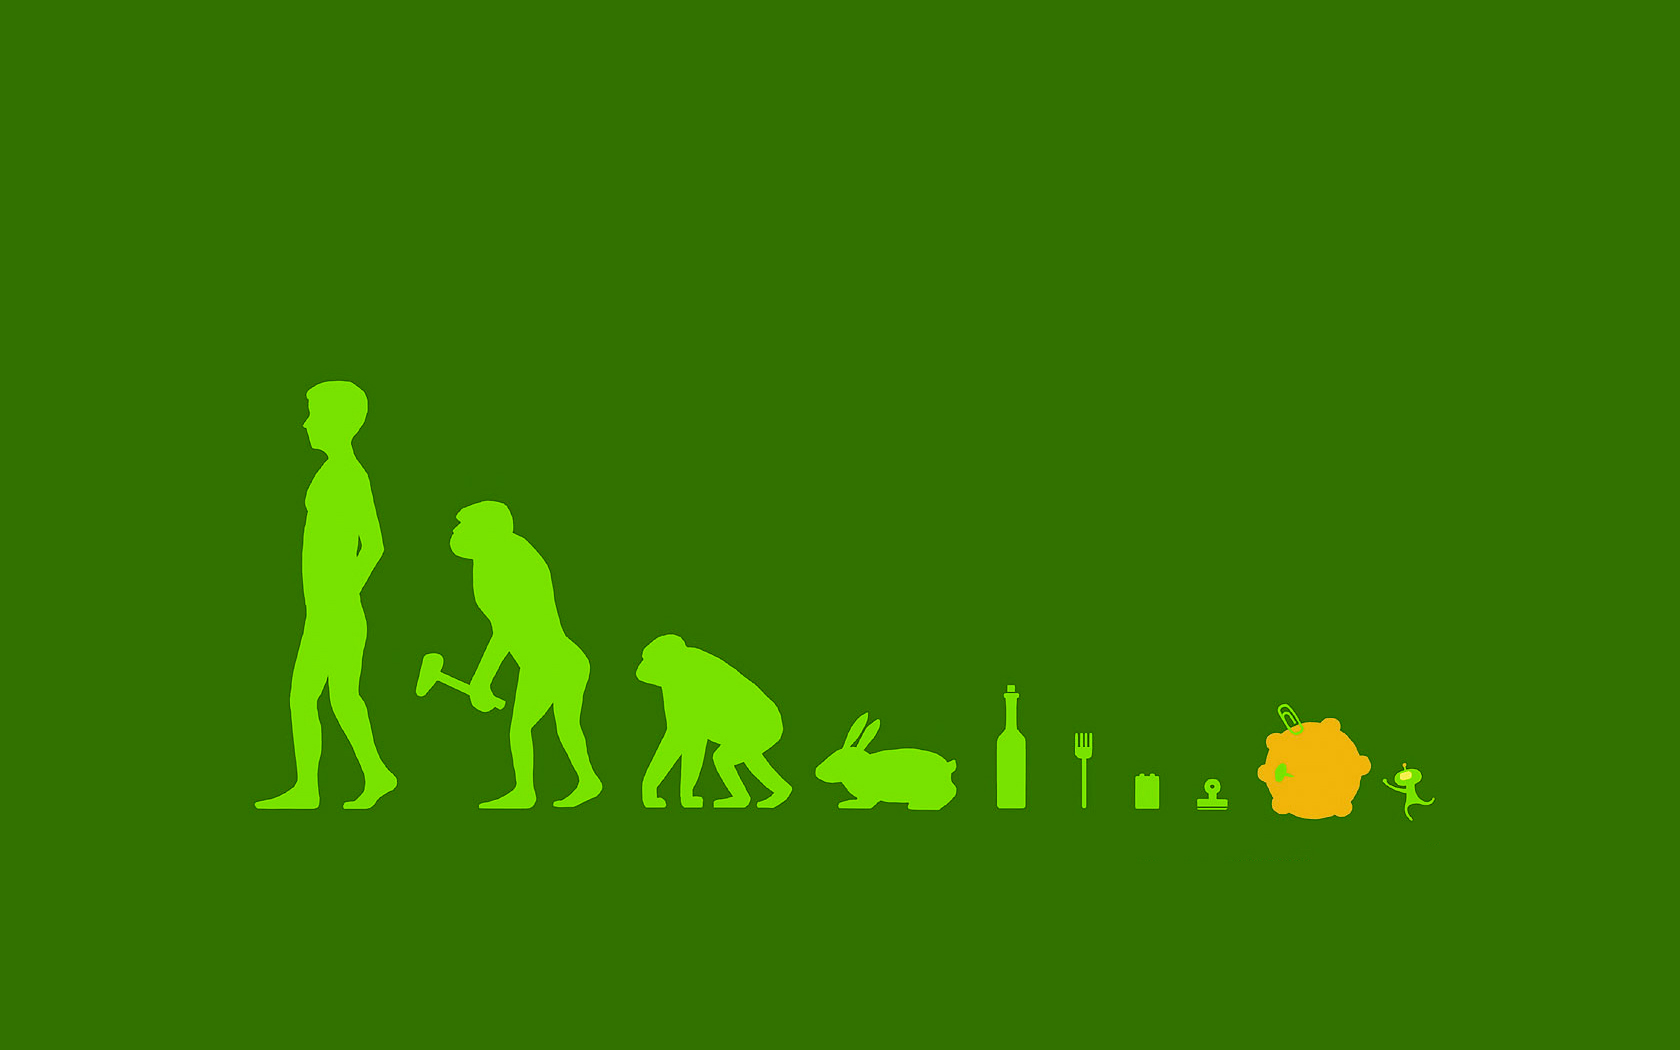 Katamari Evolution Wallpaper 1680x1050 Katamari Evolution Fun Art 1680x1050